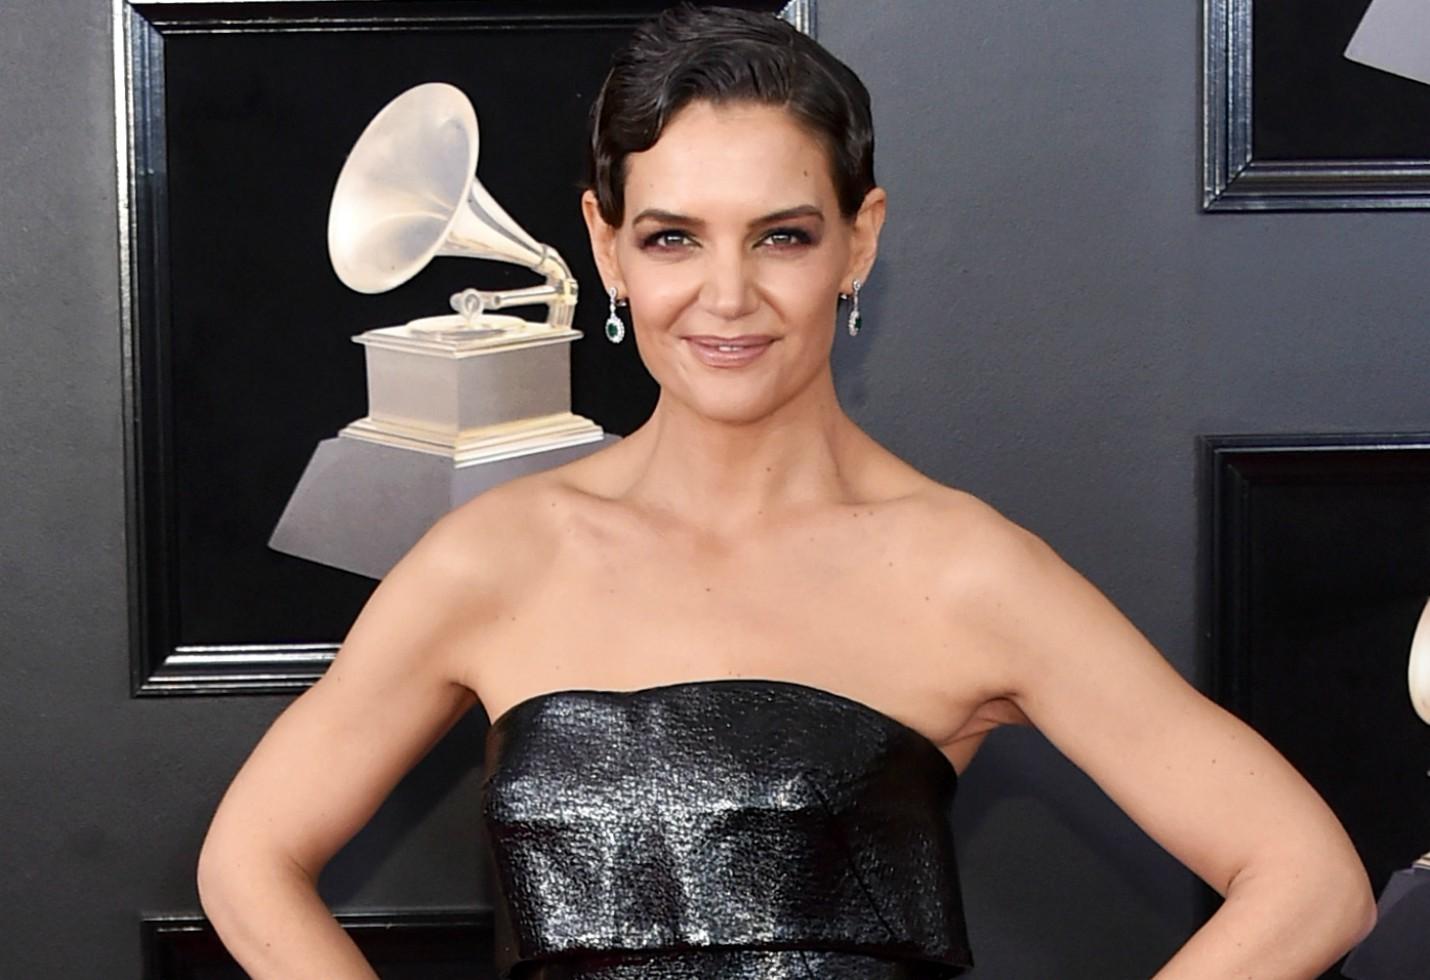 Grammy awards red carpet fashion photos